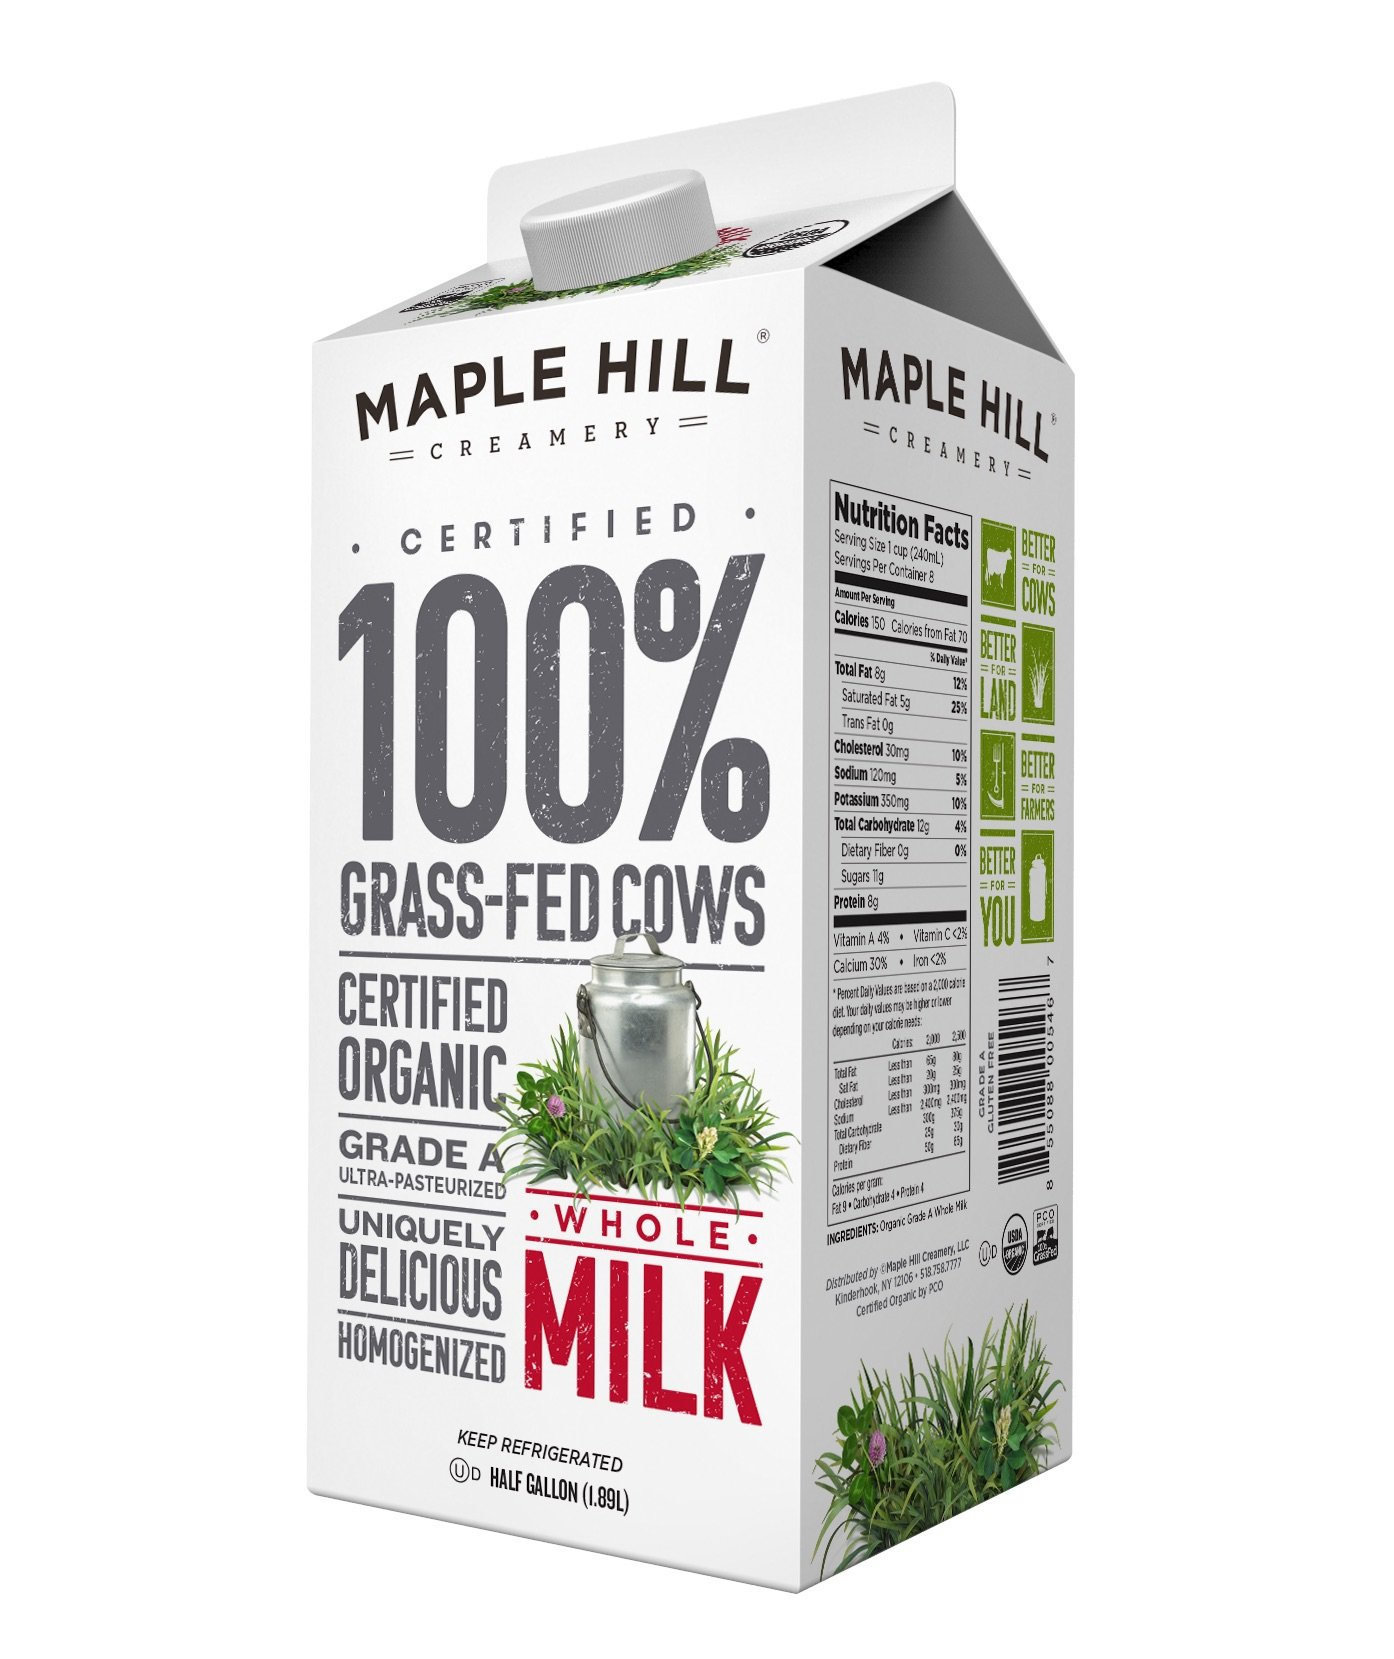 Cheap 3 25 Homogenized Milk, find 3 25 Homogenized Milk ...